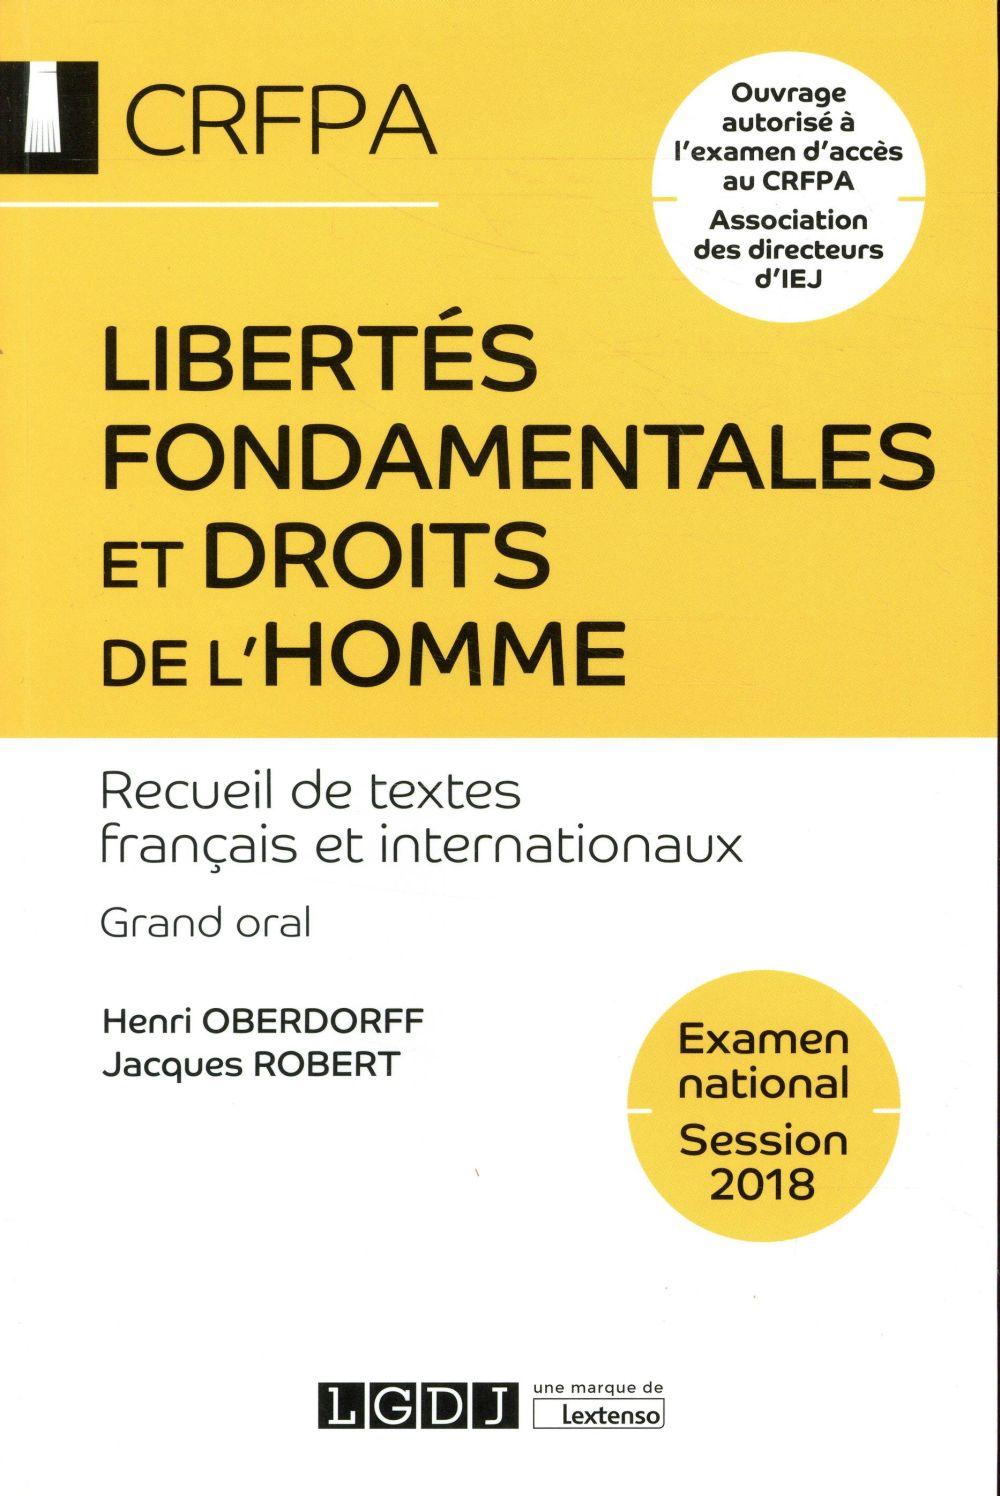 Libertés fondamentales et droits de l'homme ; CRFPA, examen national (16e édition)